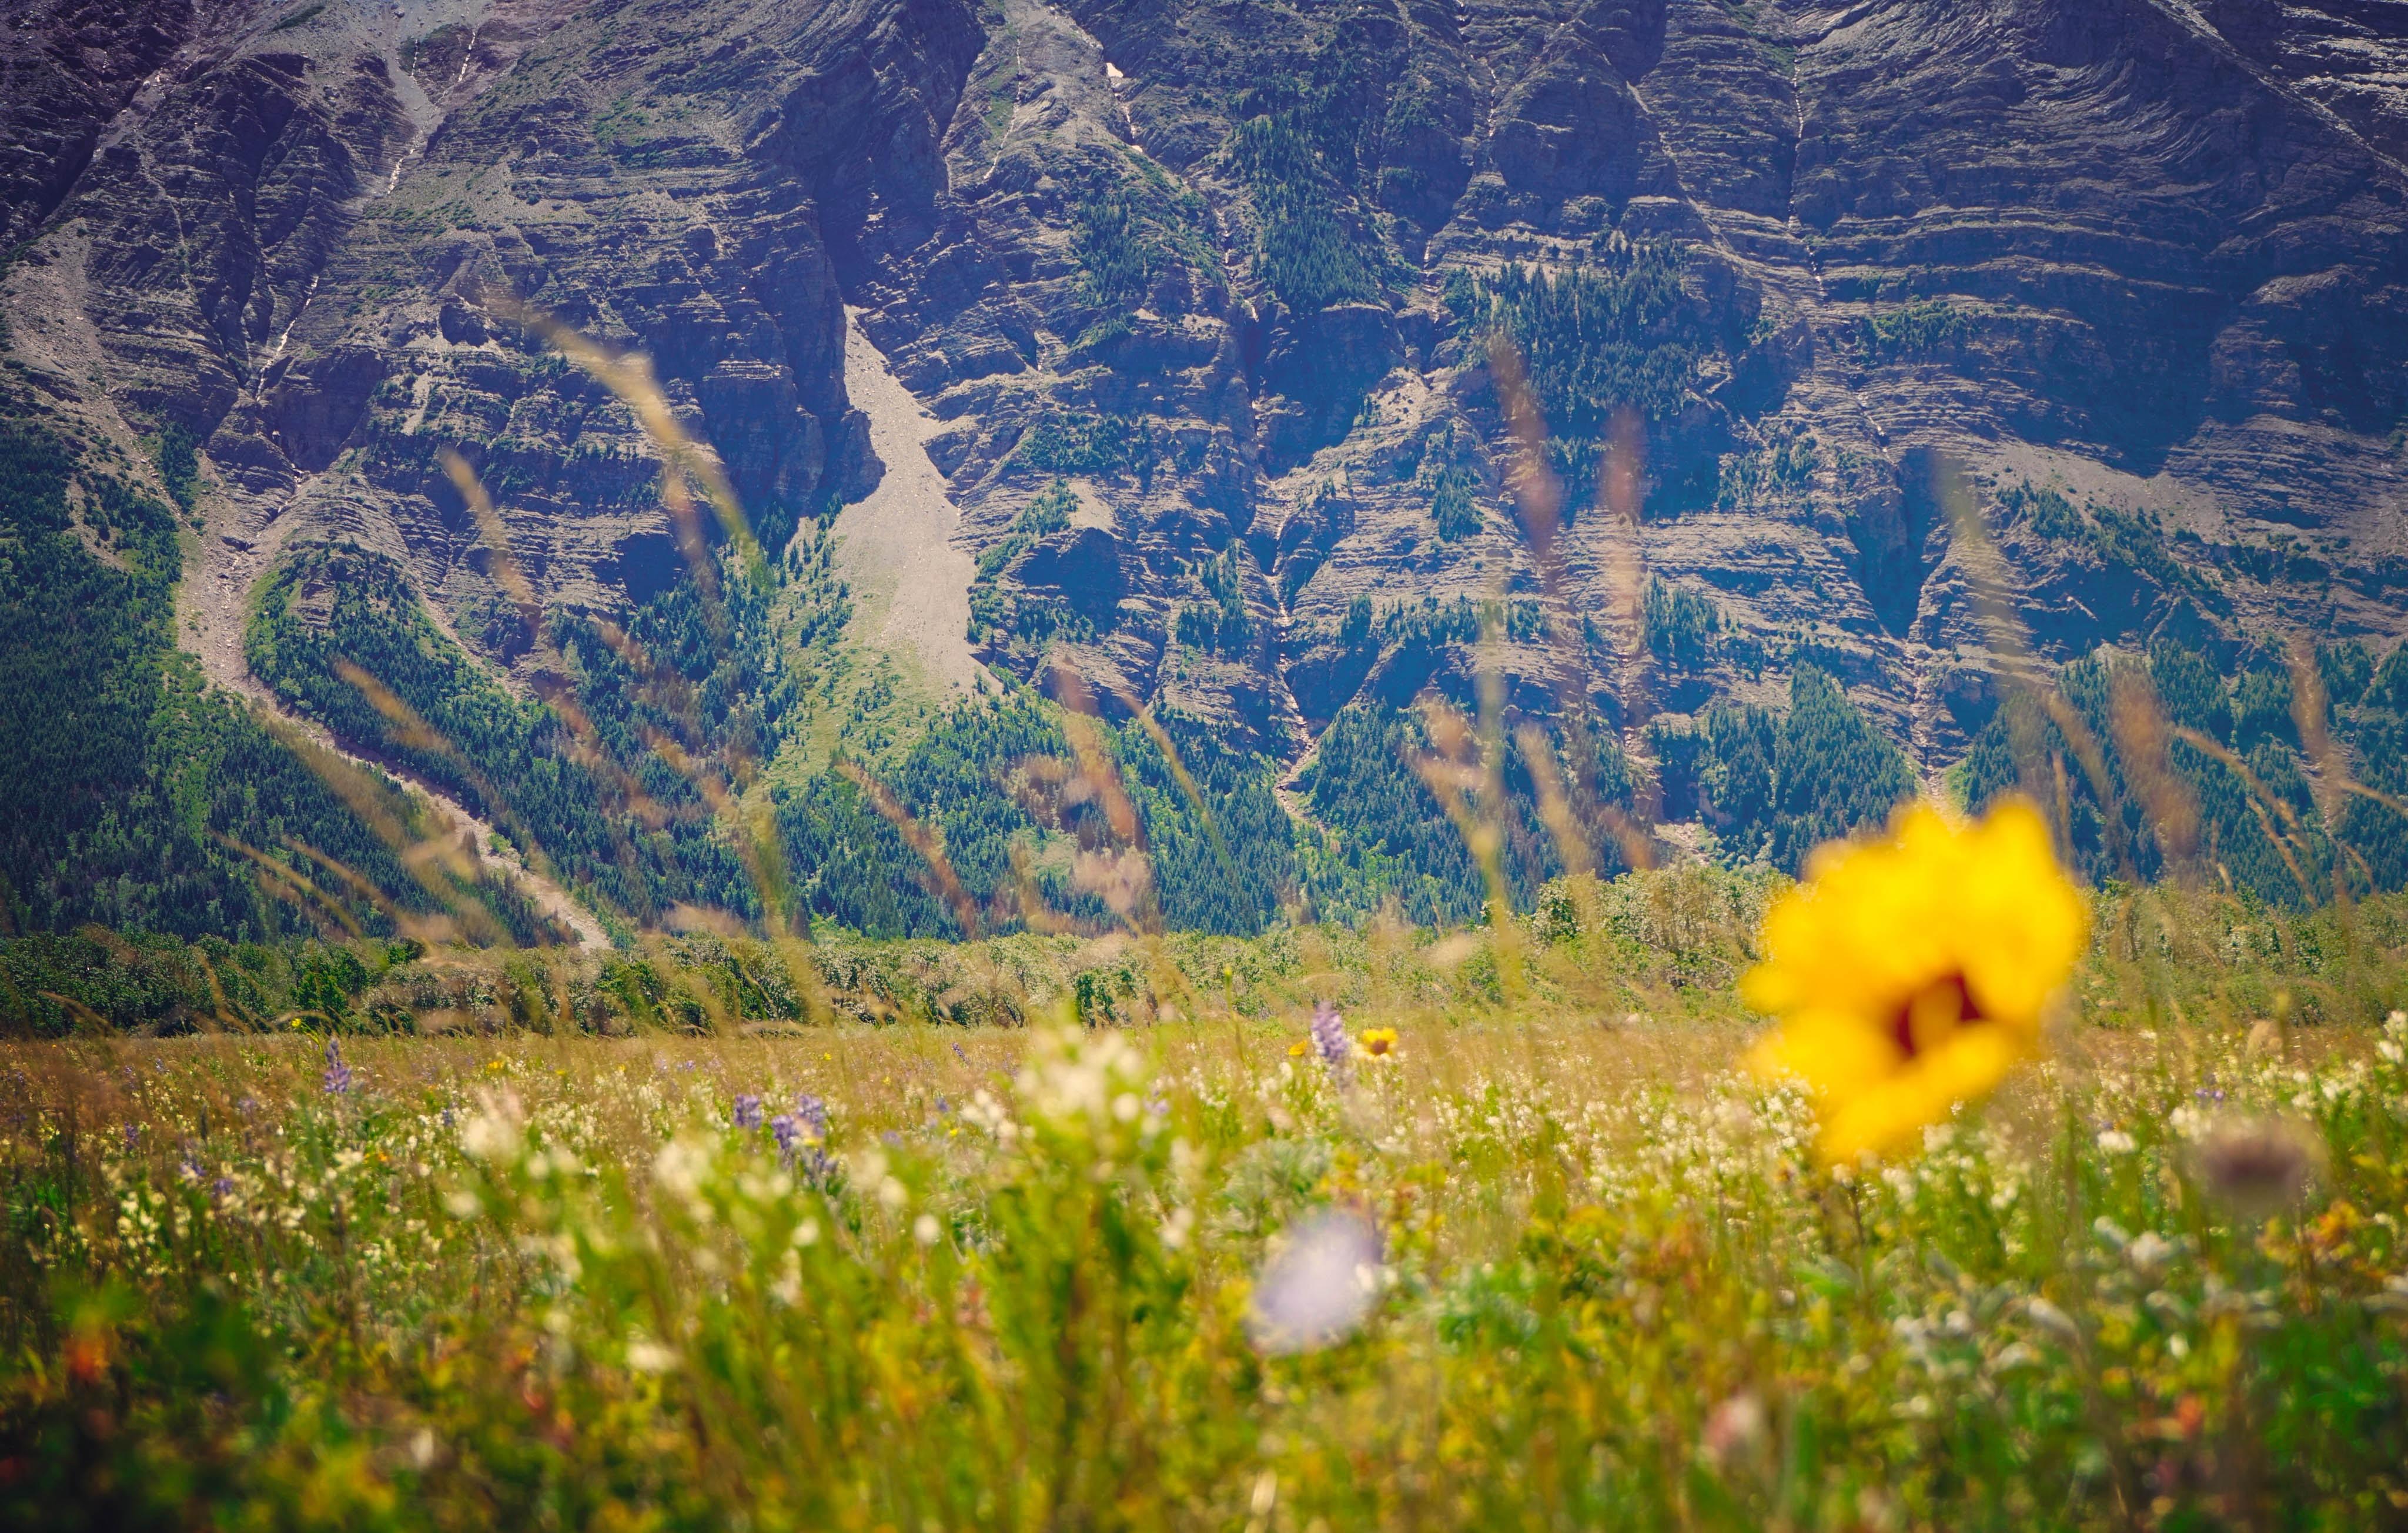 yellow petaled flower on grass field